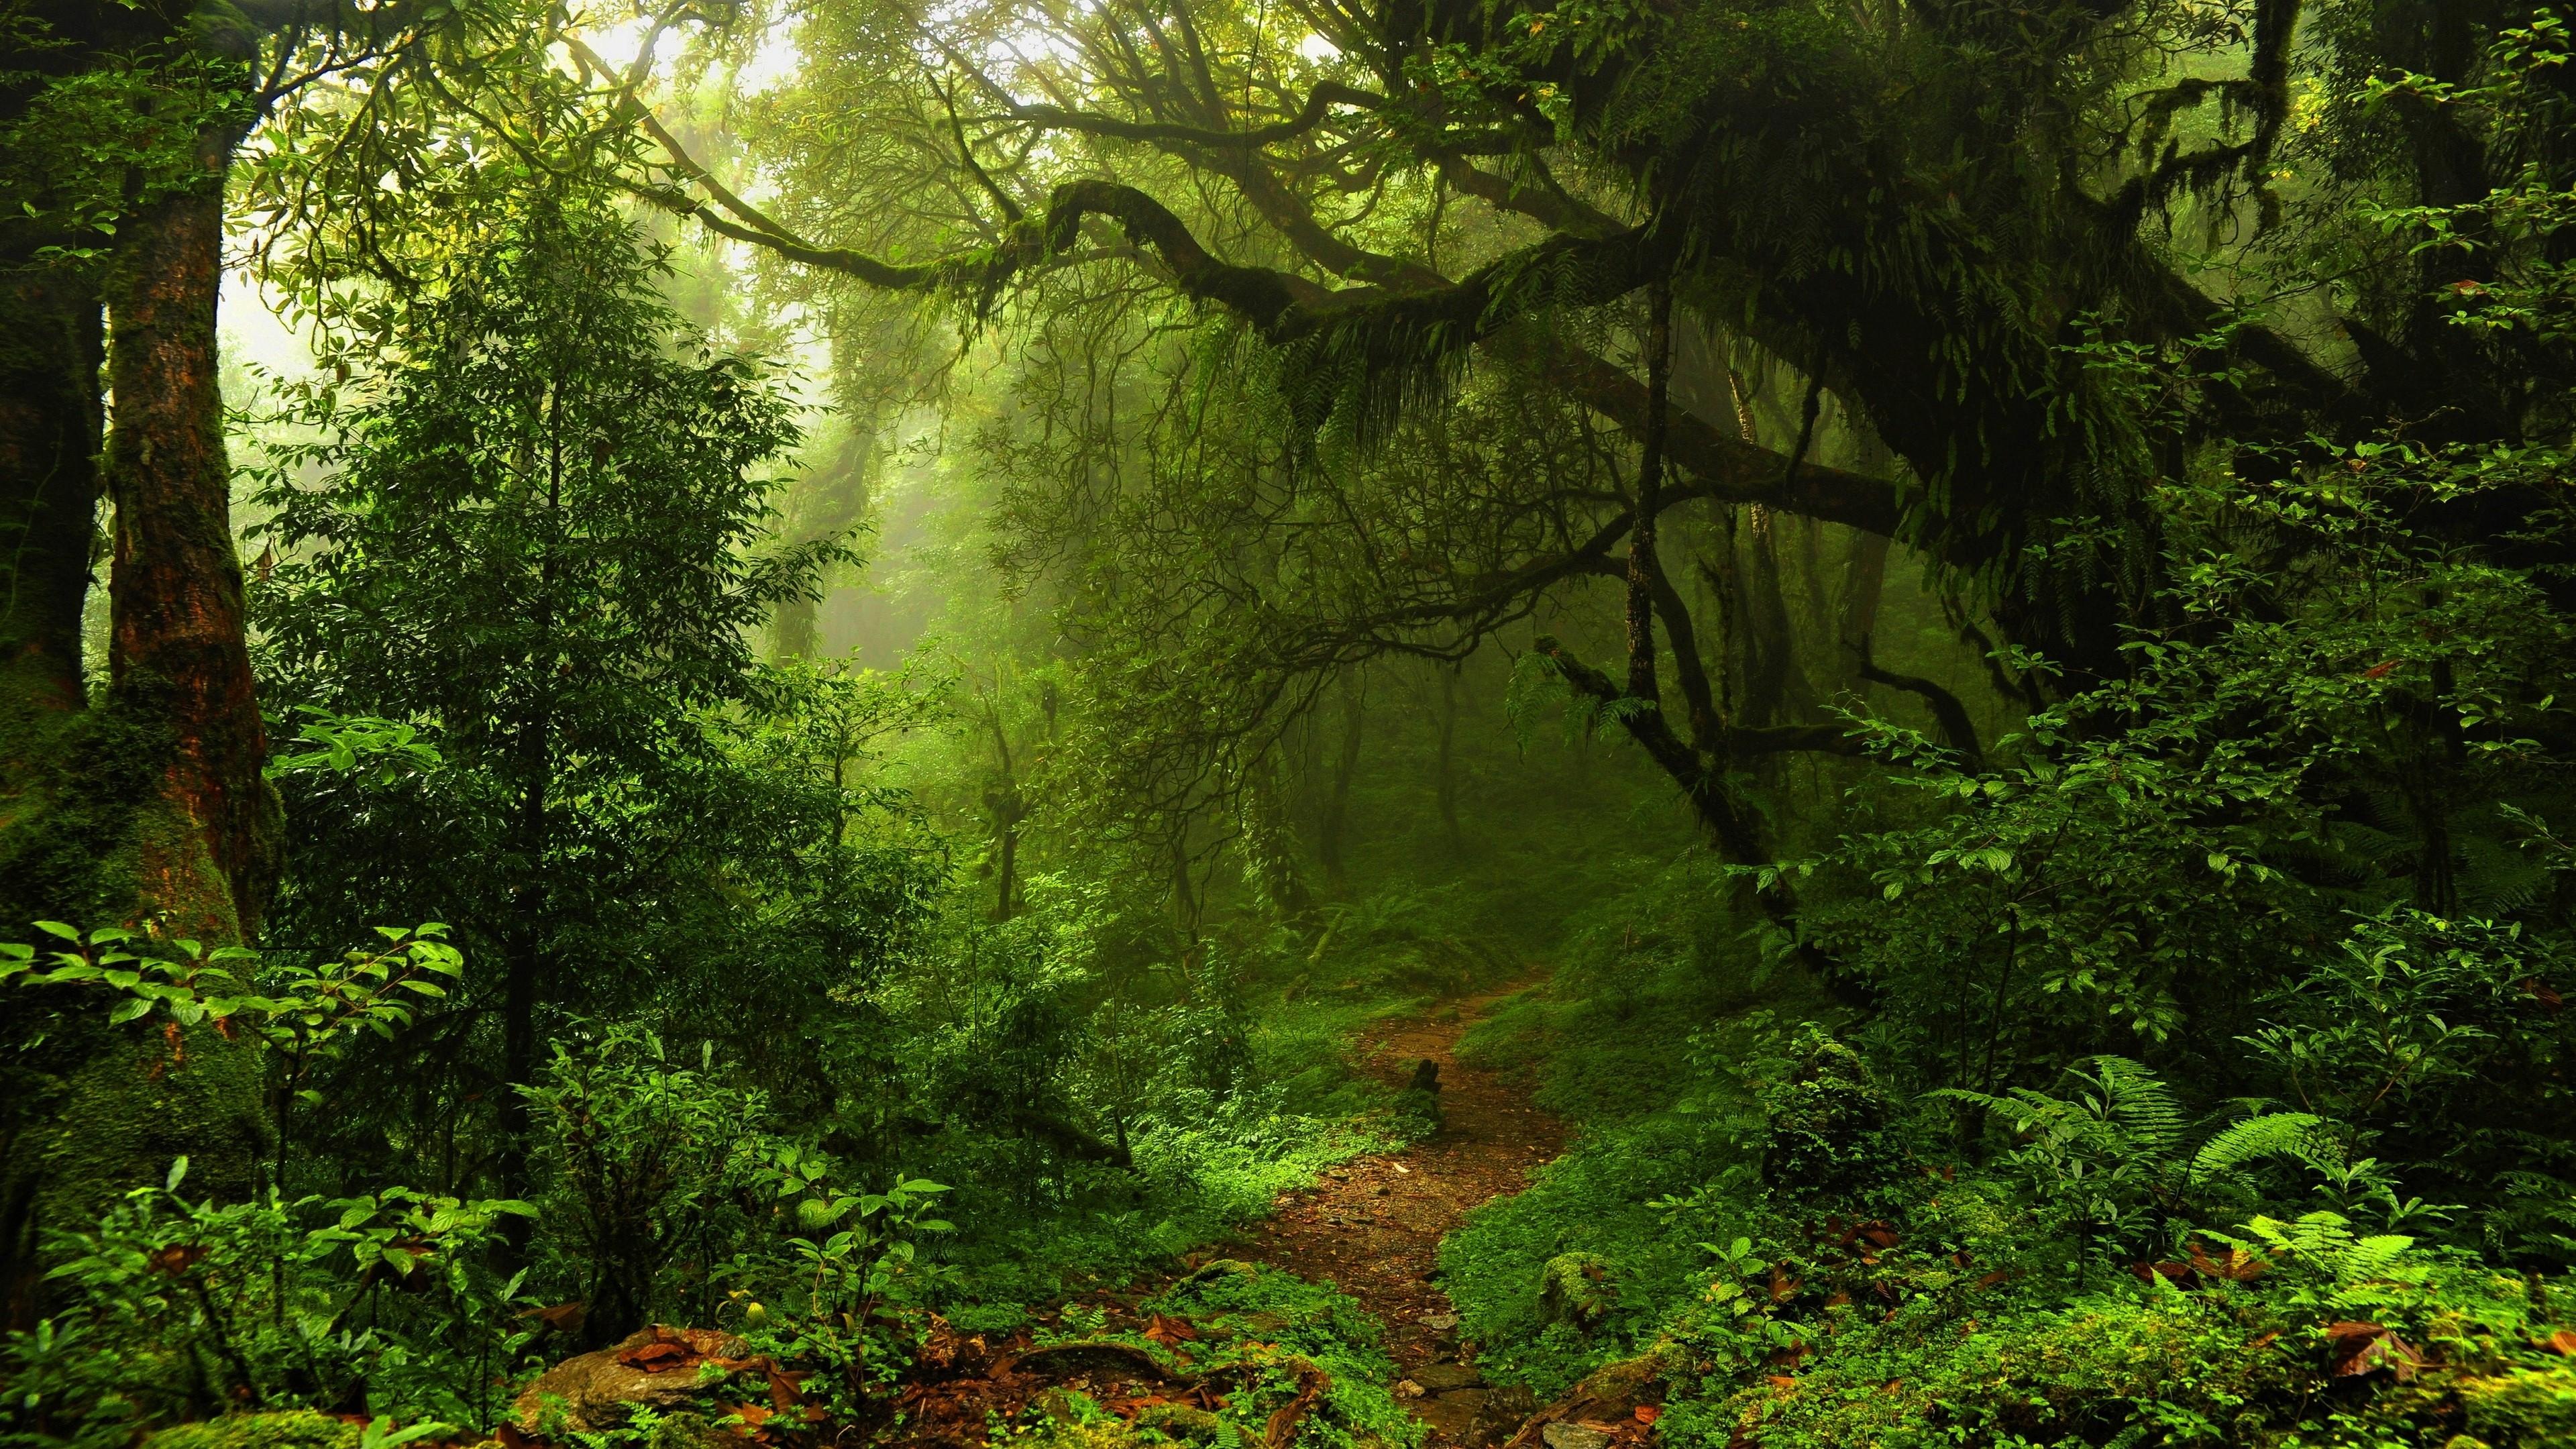 Sunlight In Green Forest 4k Ultra Hd Wallpaper Background